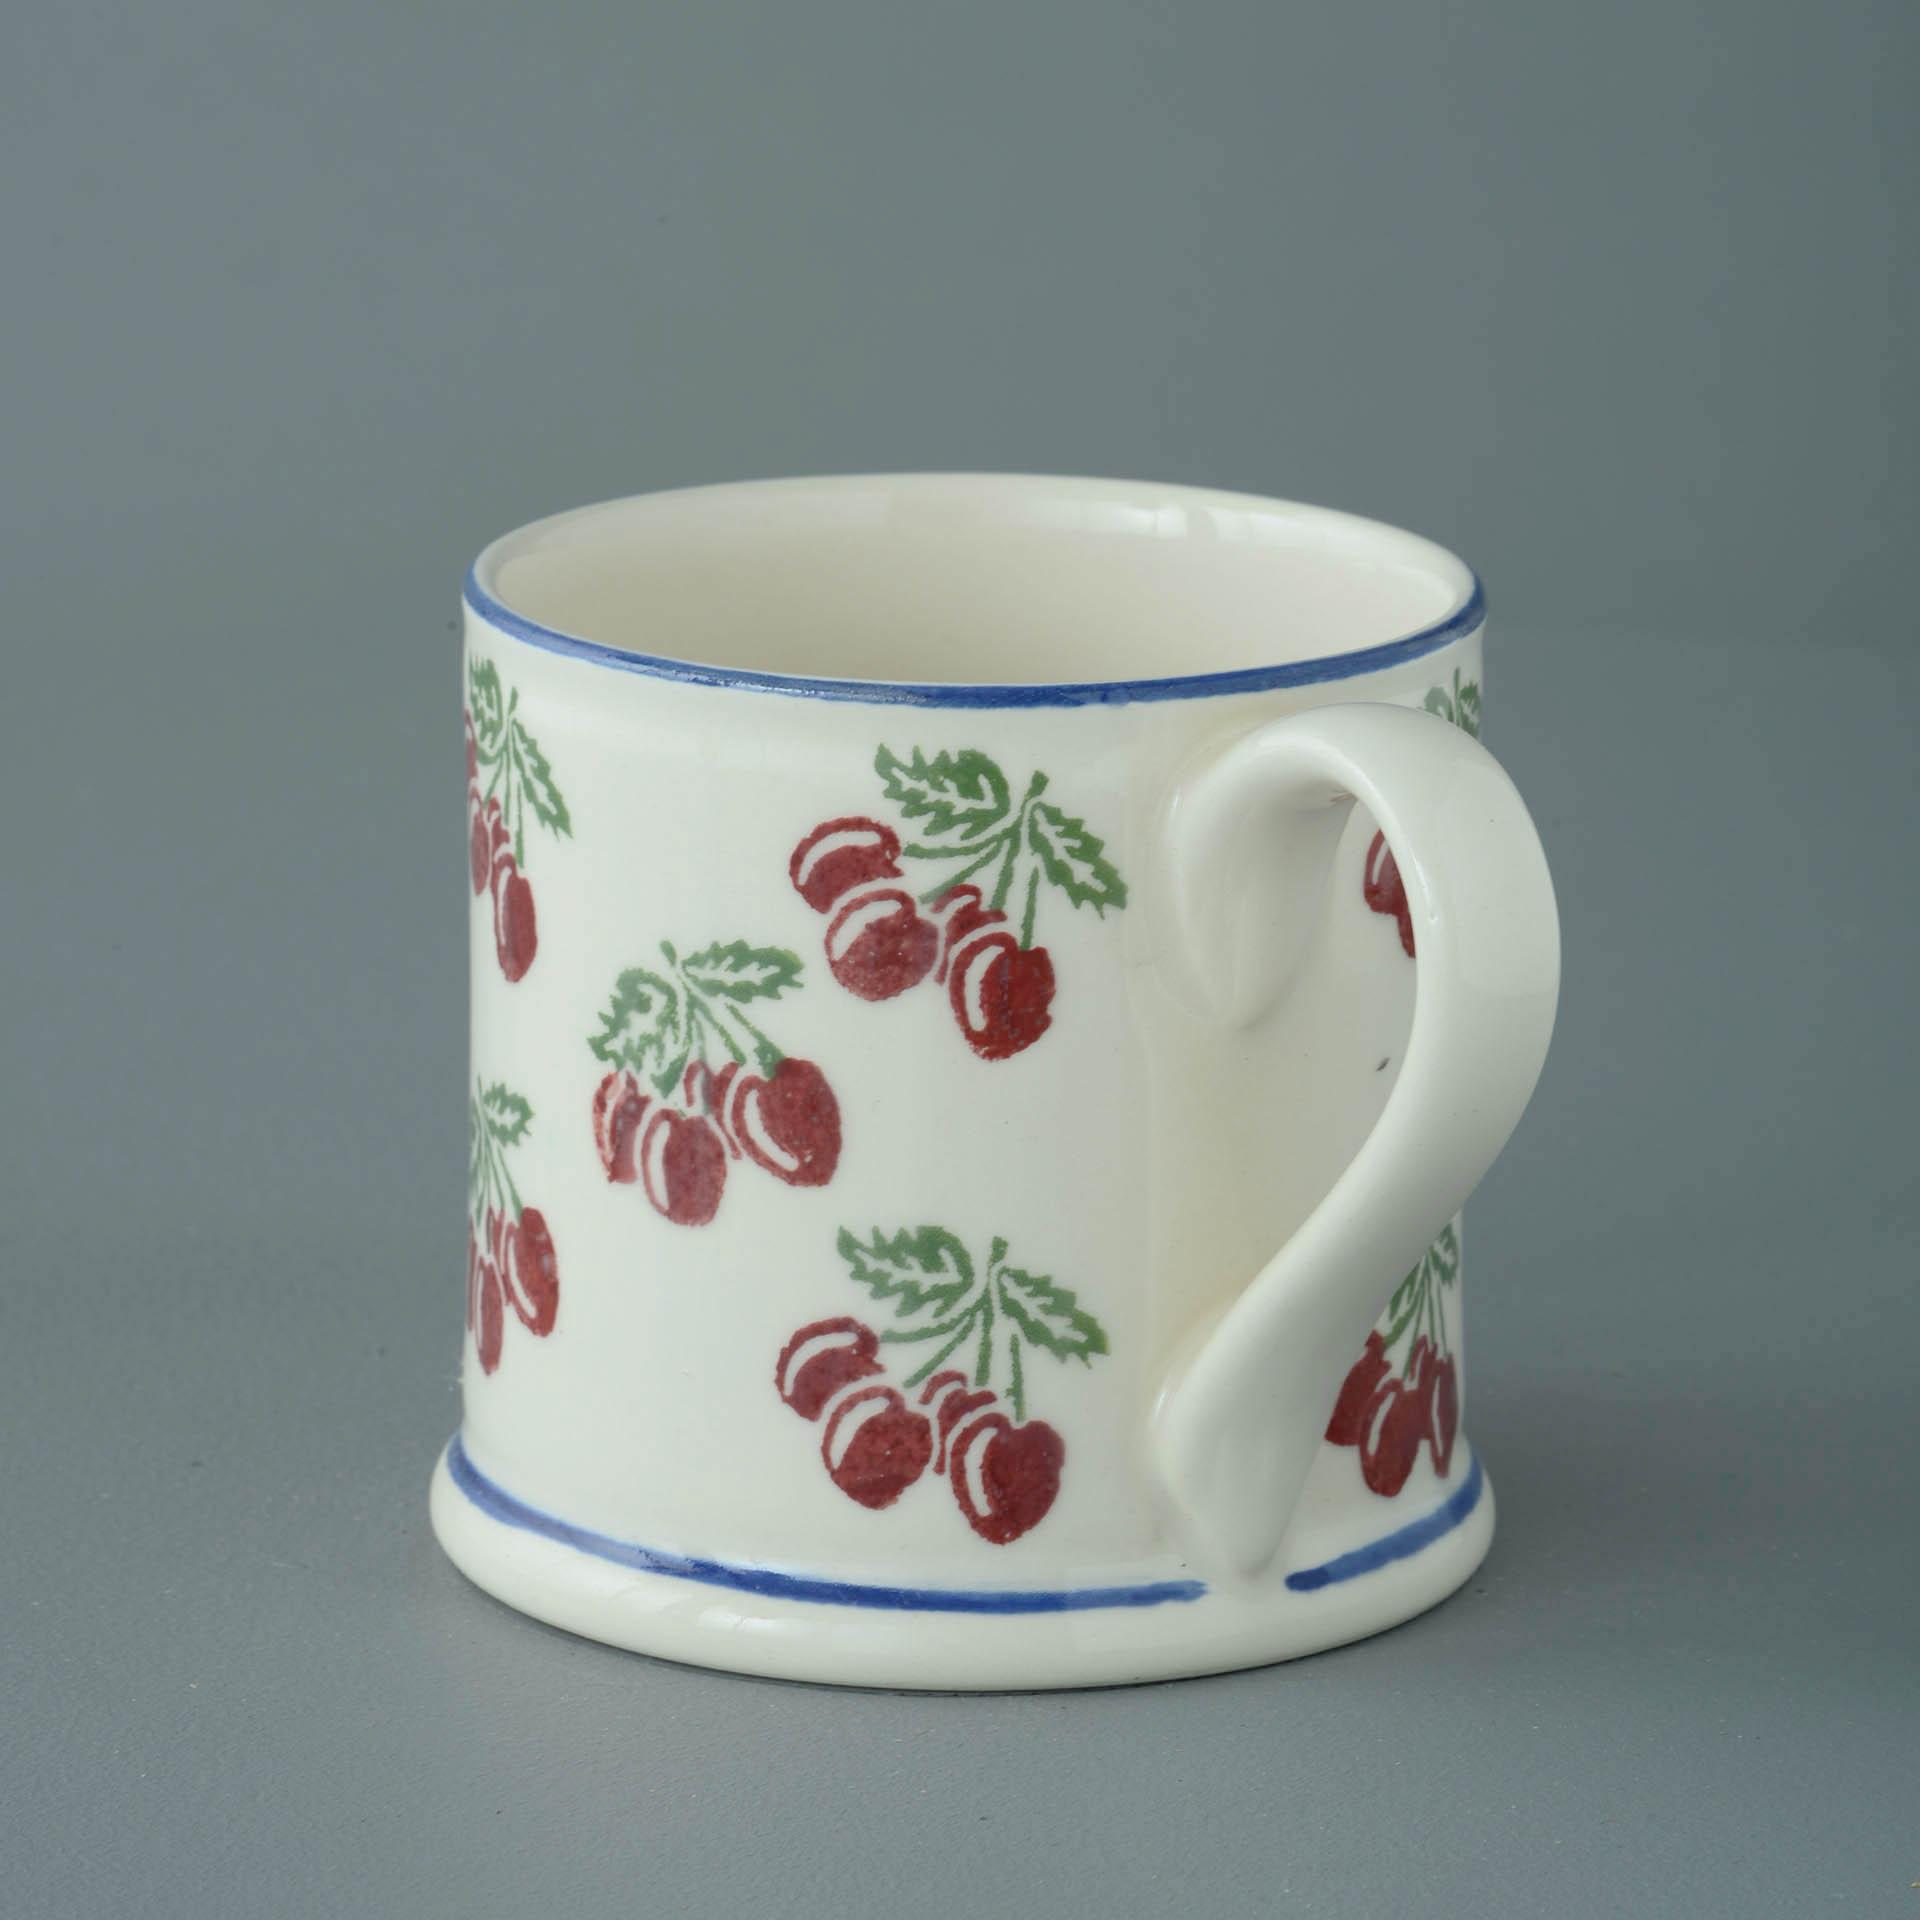 Cherries 250ml Large Mug 8 x 8.4cm